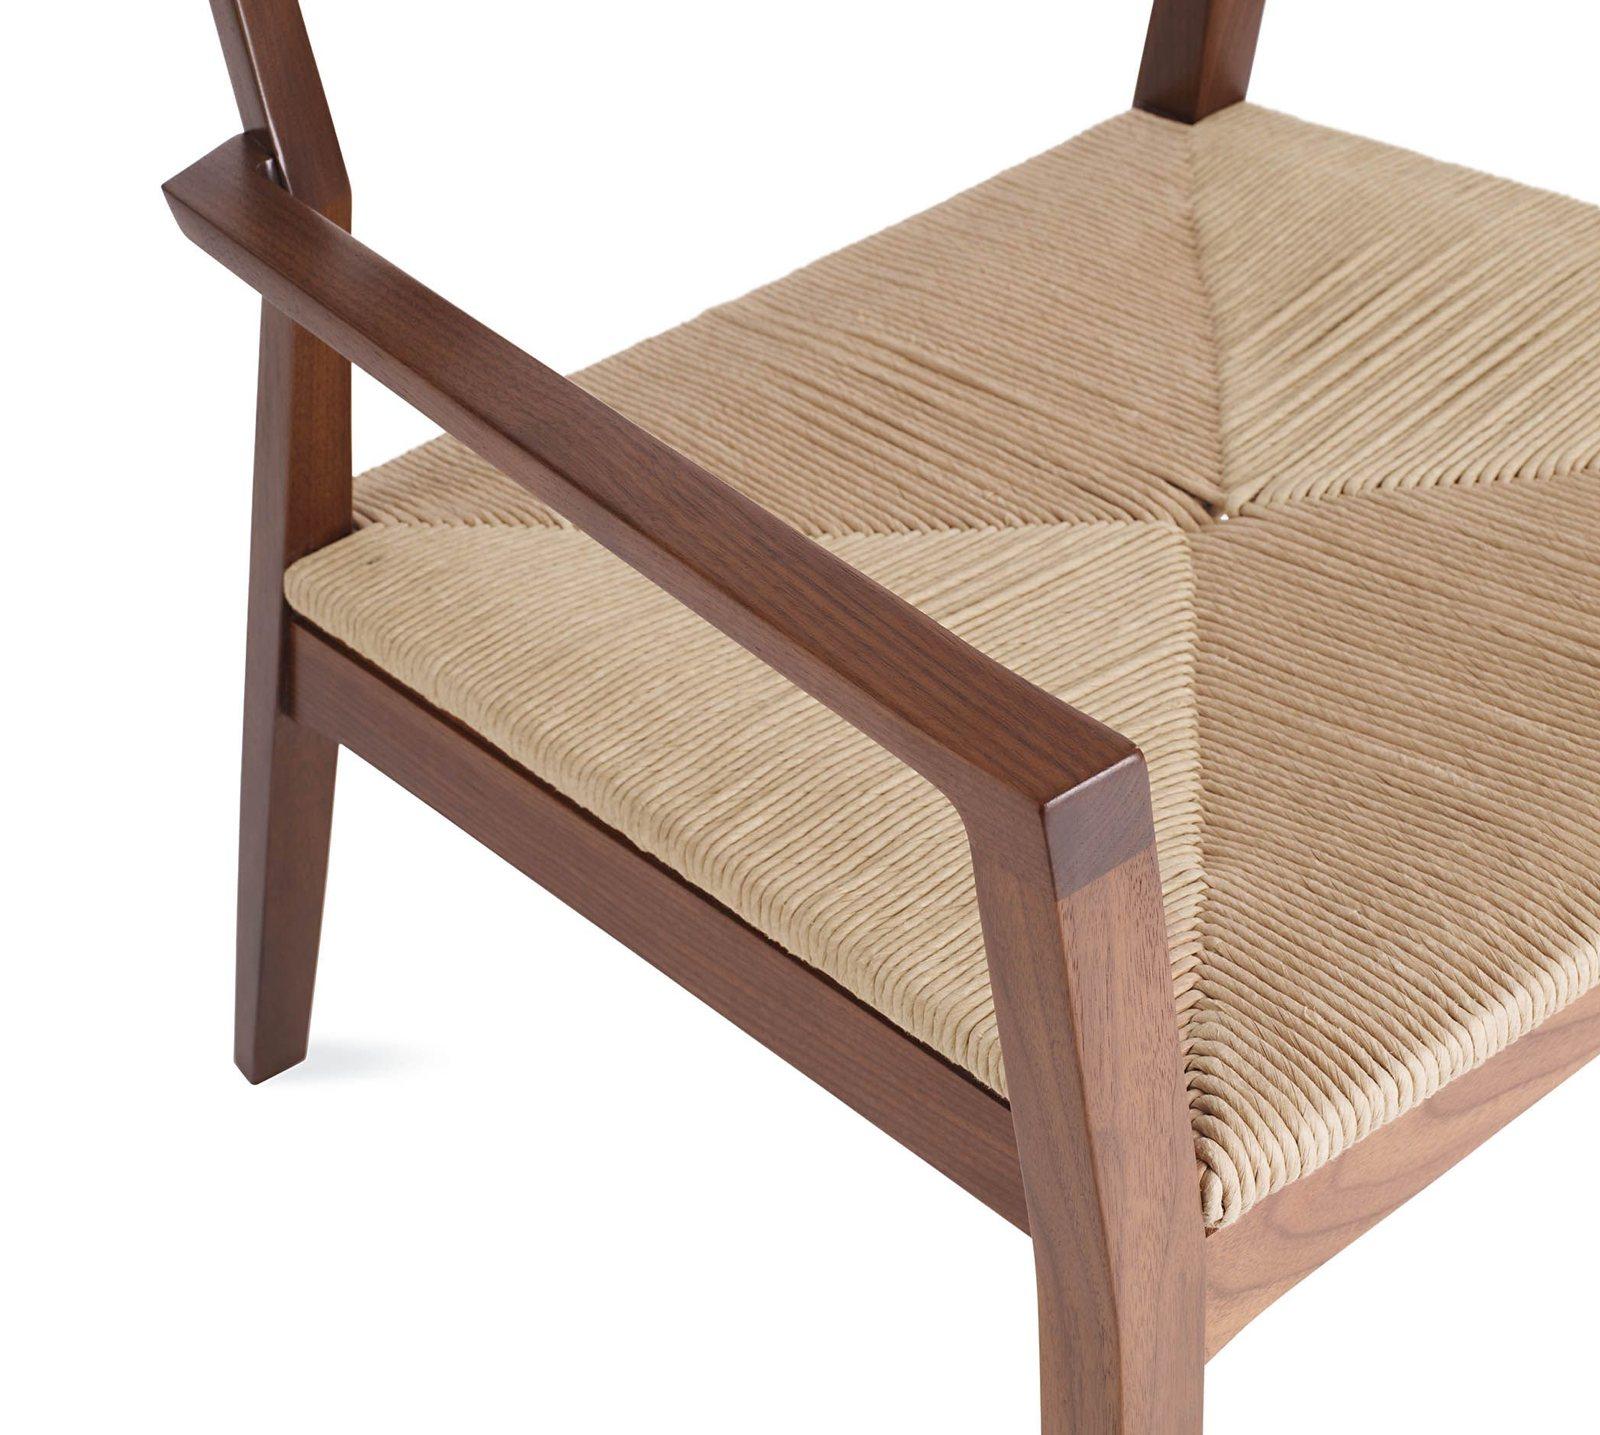 Strange Knoll Krusin Lounge Arm Chair Creativecarmelina Interior Chair Design Creativecarmelinacom